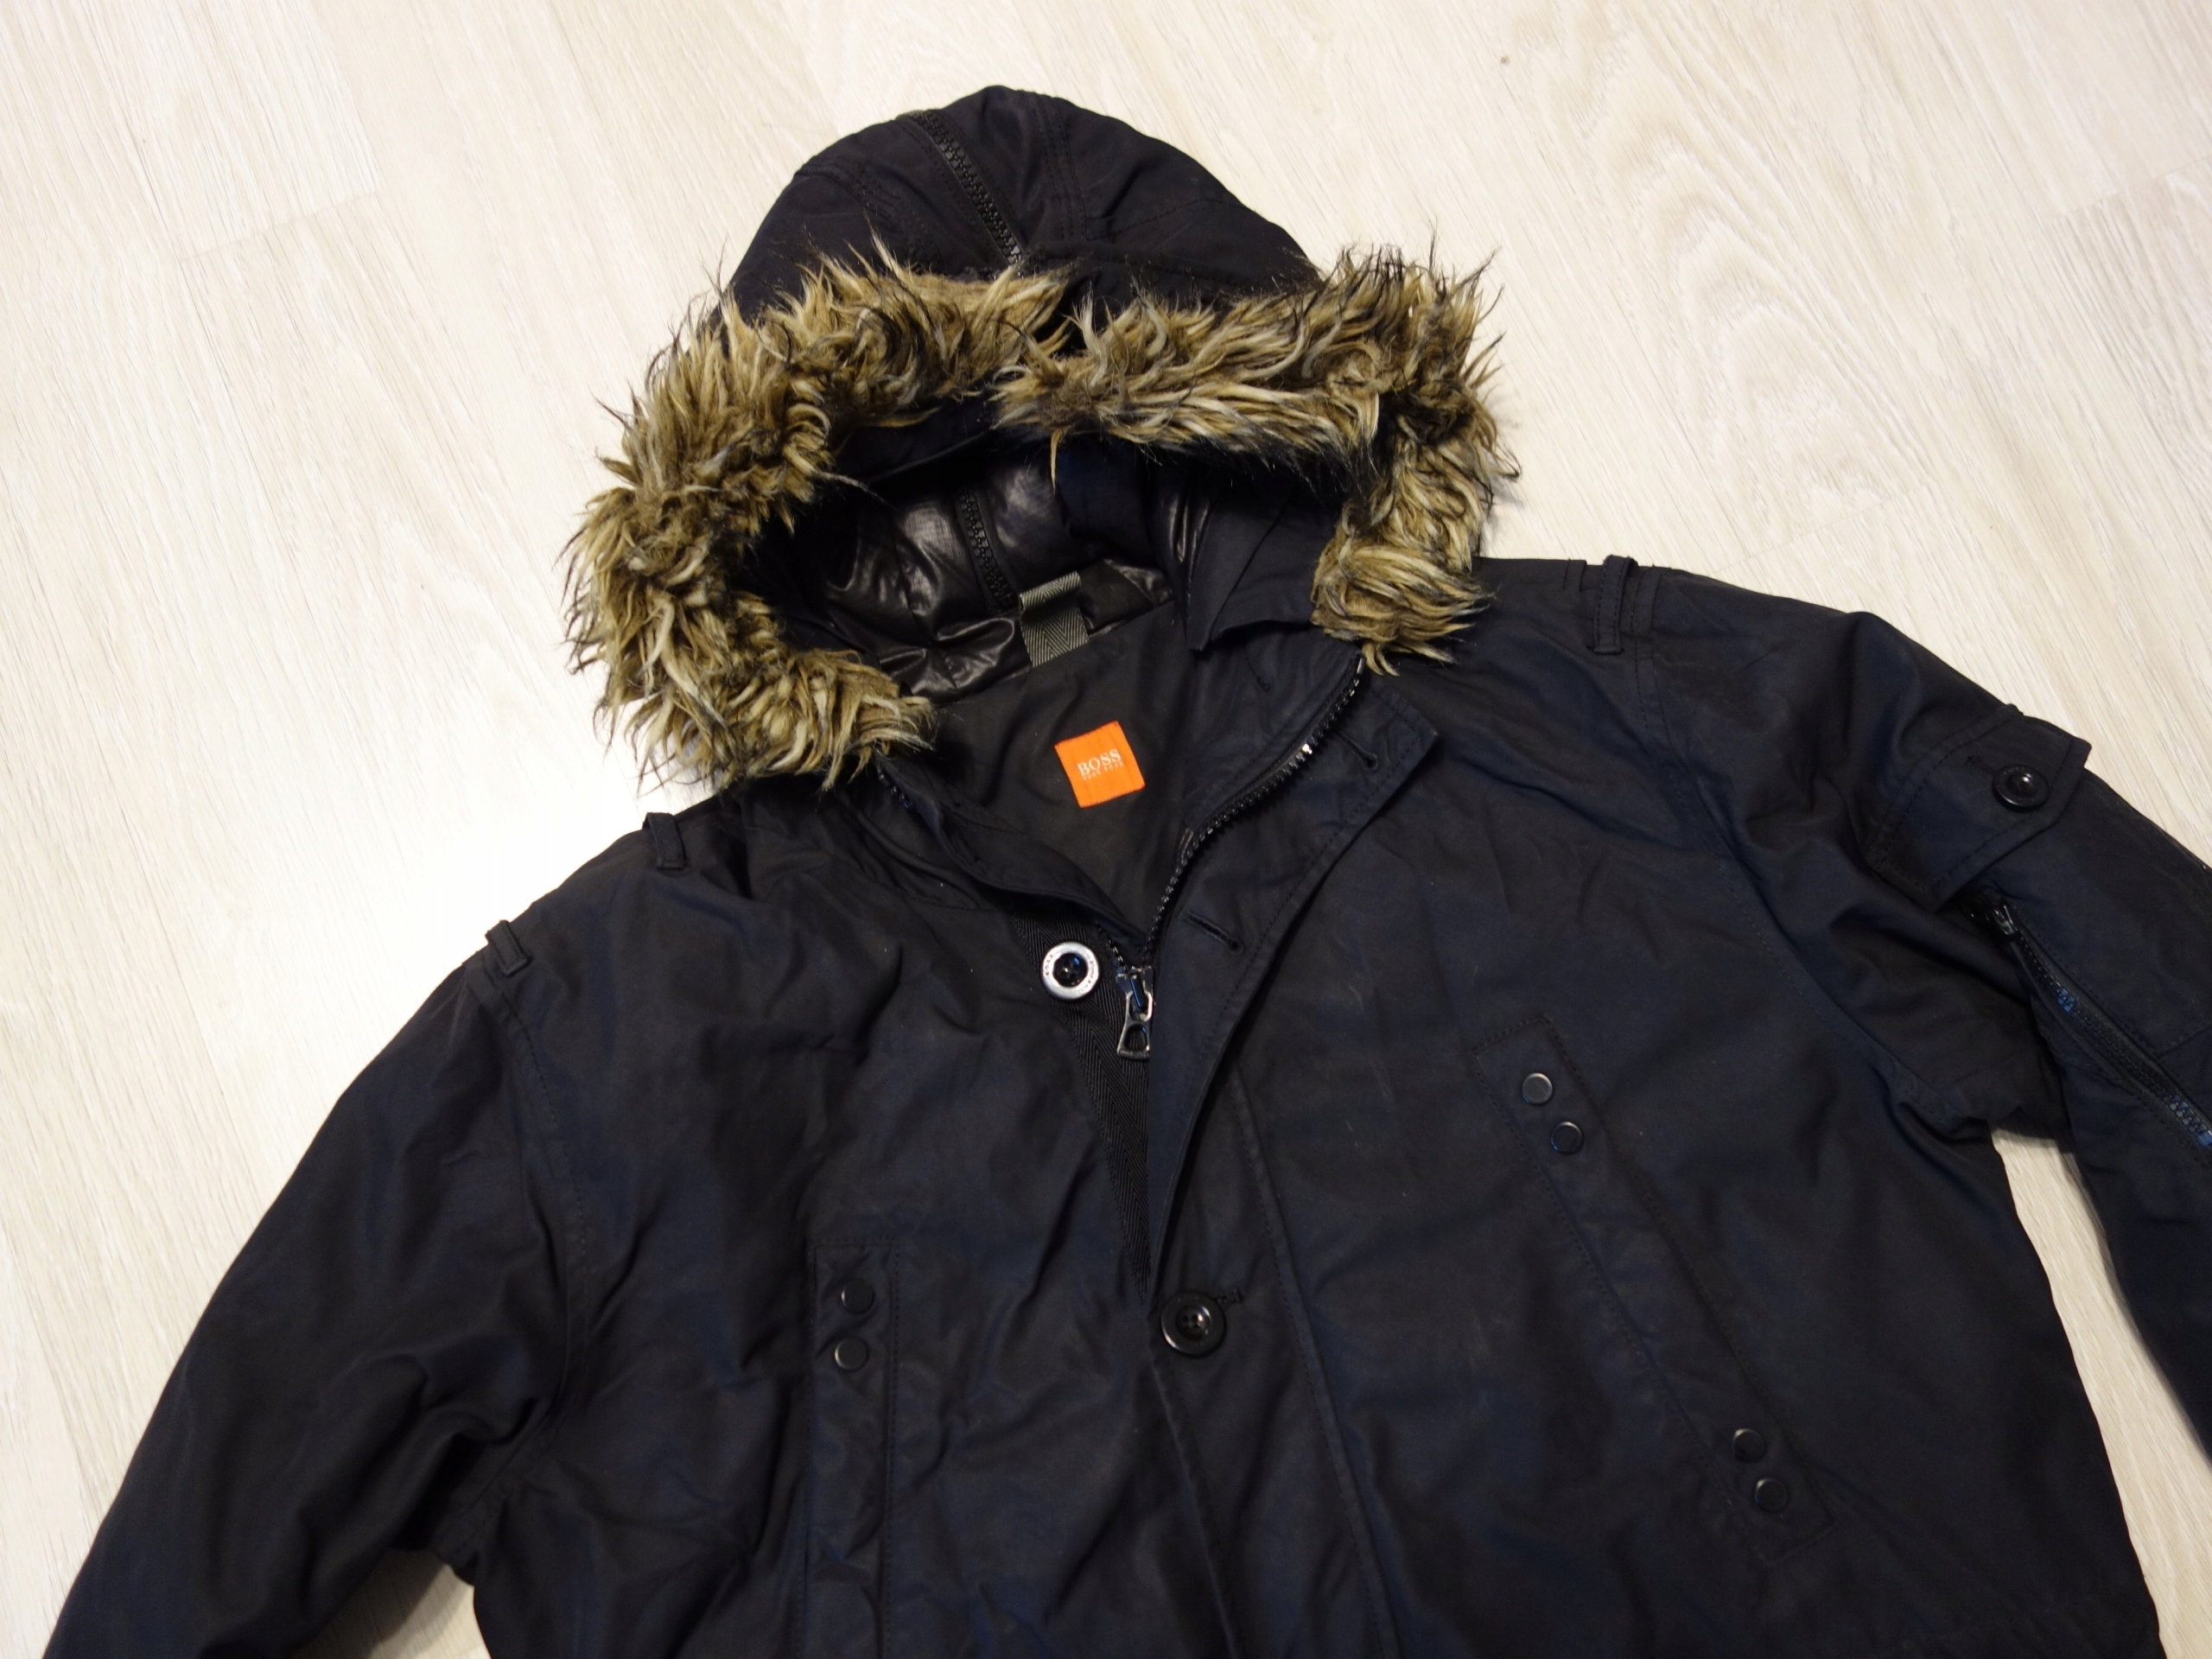 9b8e88496274d HUGO BOSS Orange puchowa kurtka zimowa parka 50 L - 7789784577 ...